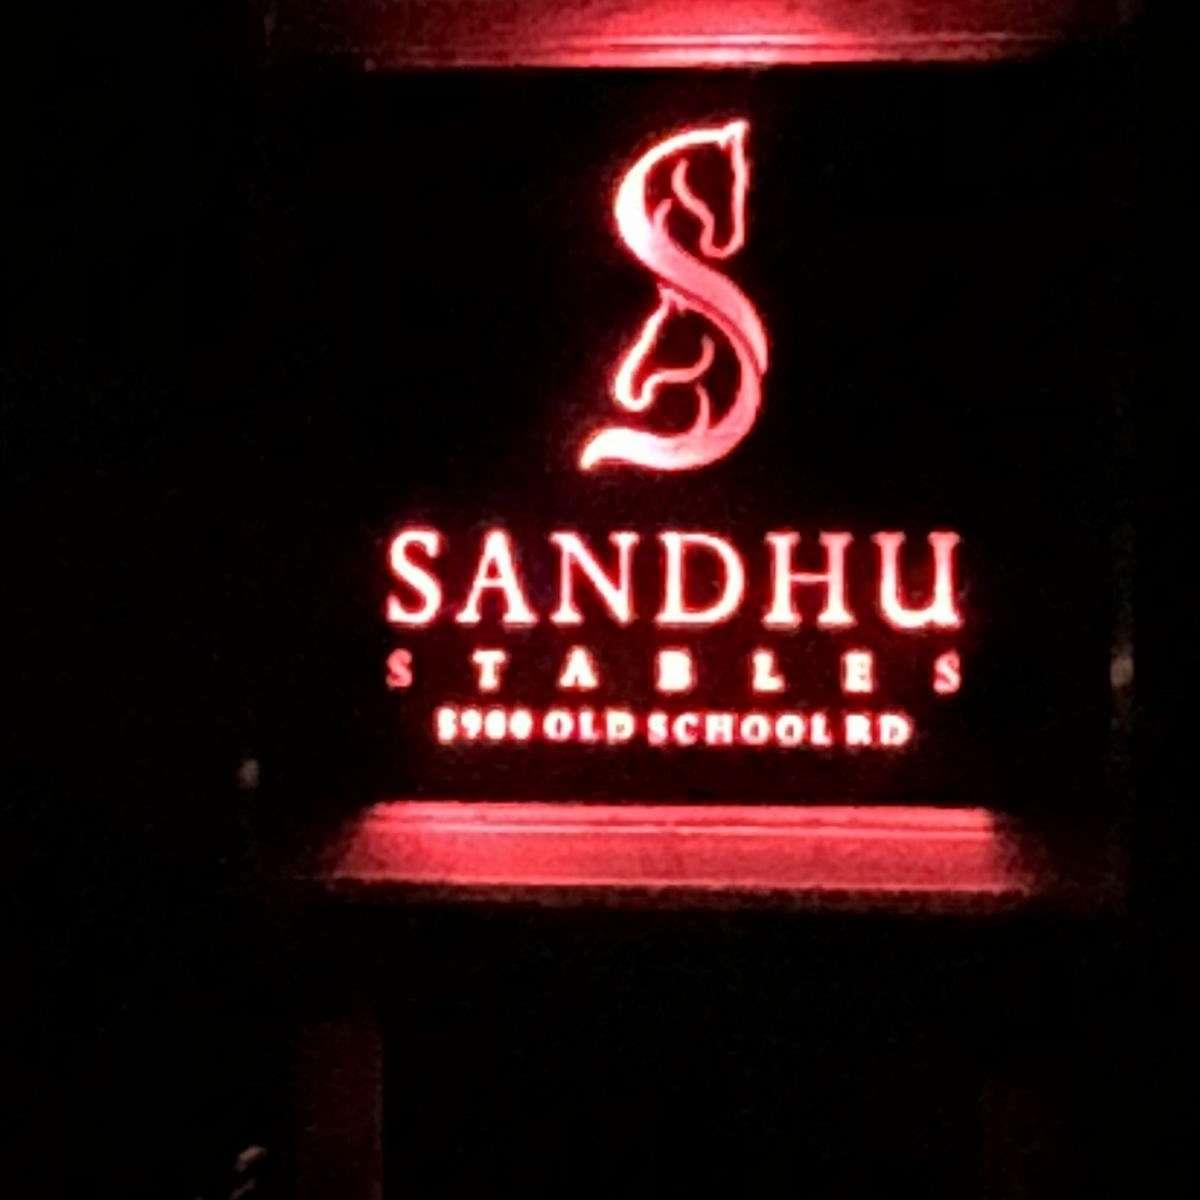 Sandhu Stables